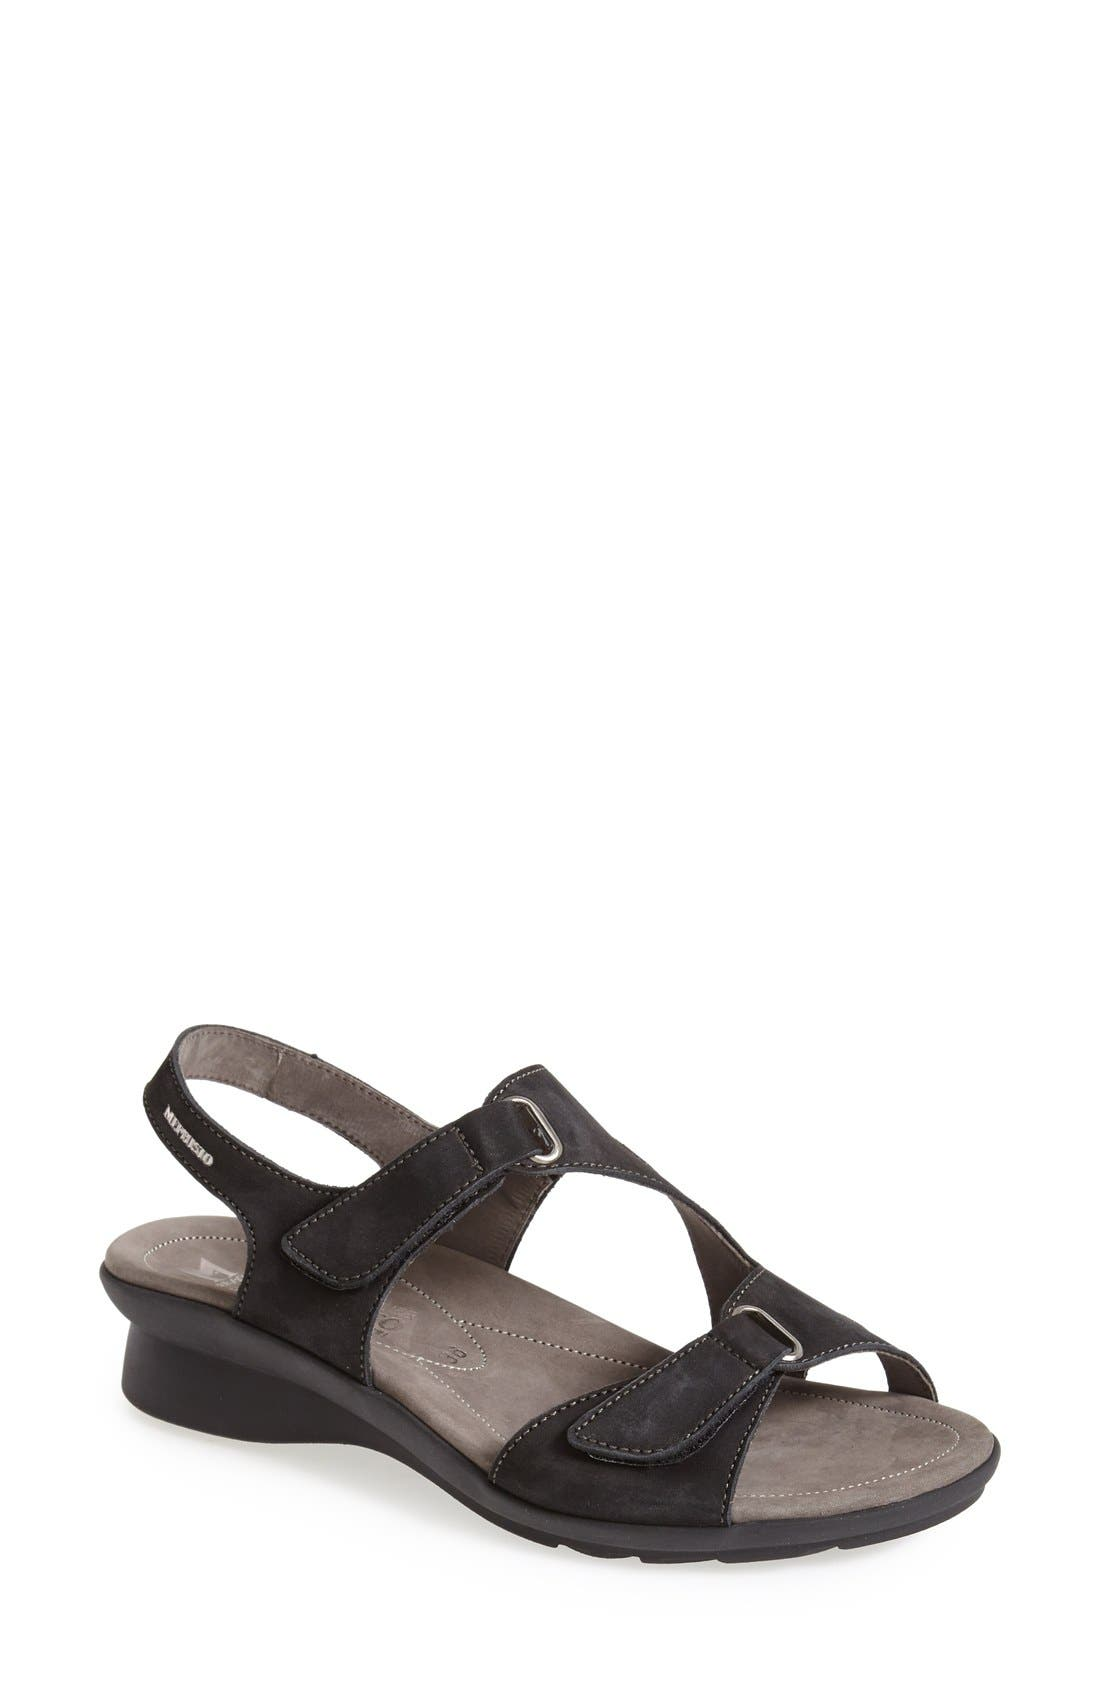 MEPHISTO 'Paris' Slingback Sandal, Main, color, BLACK